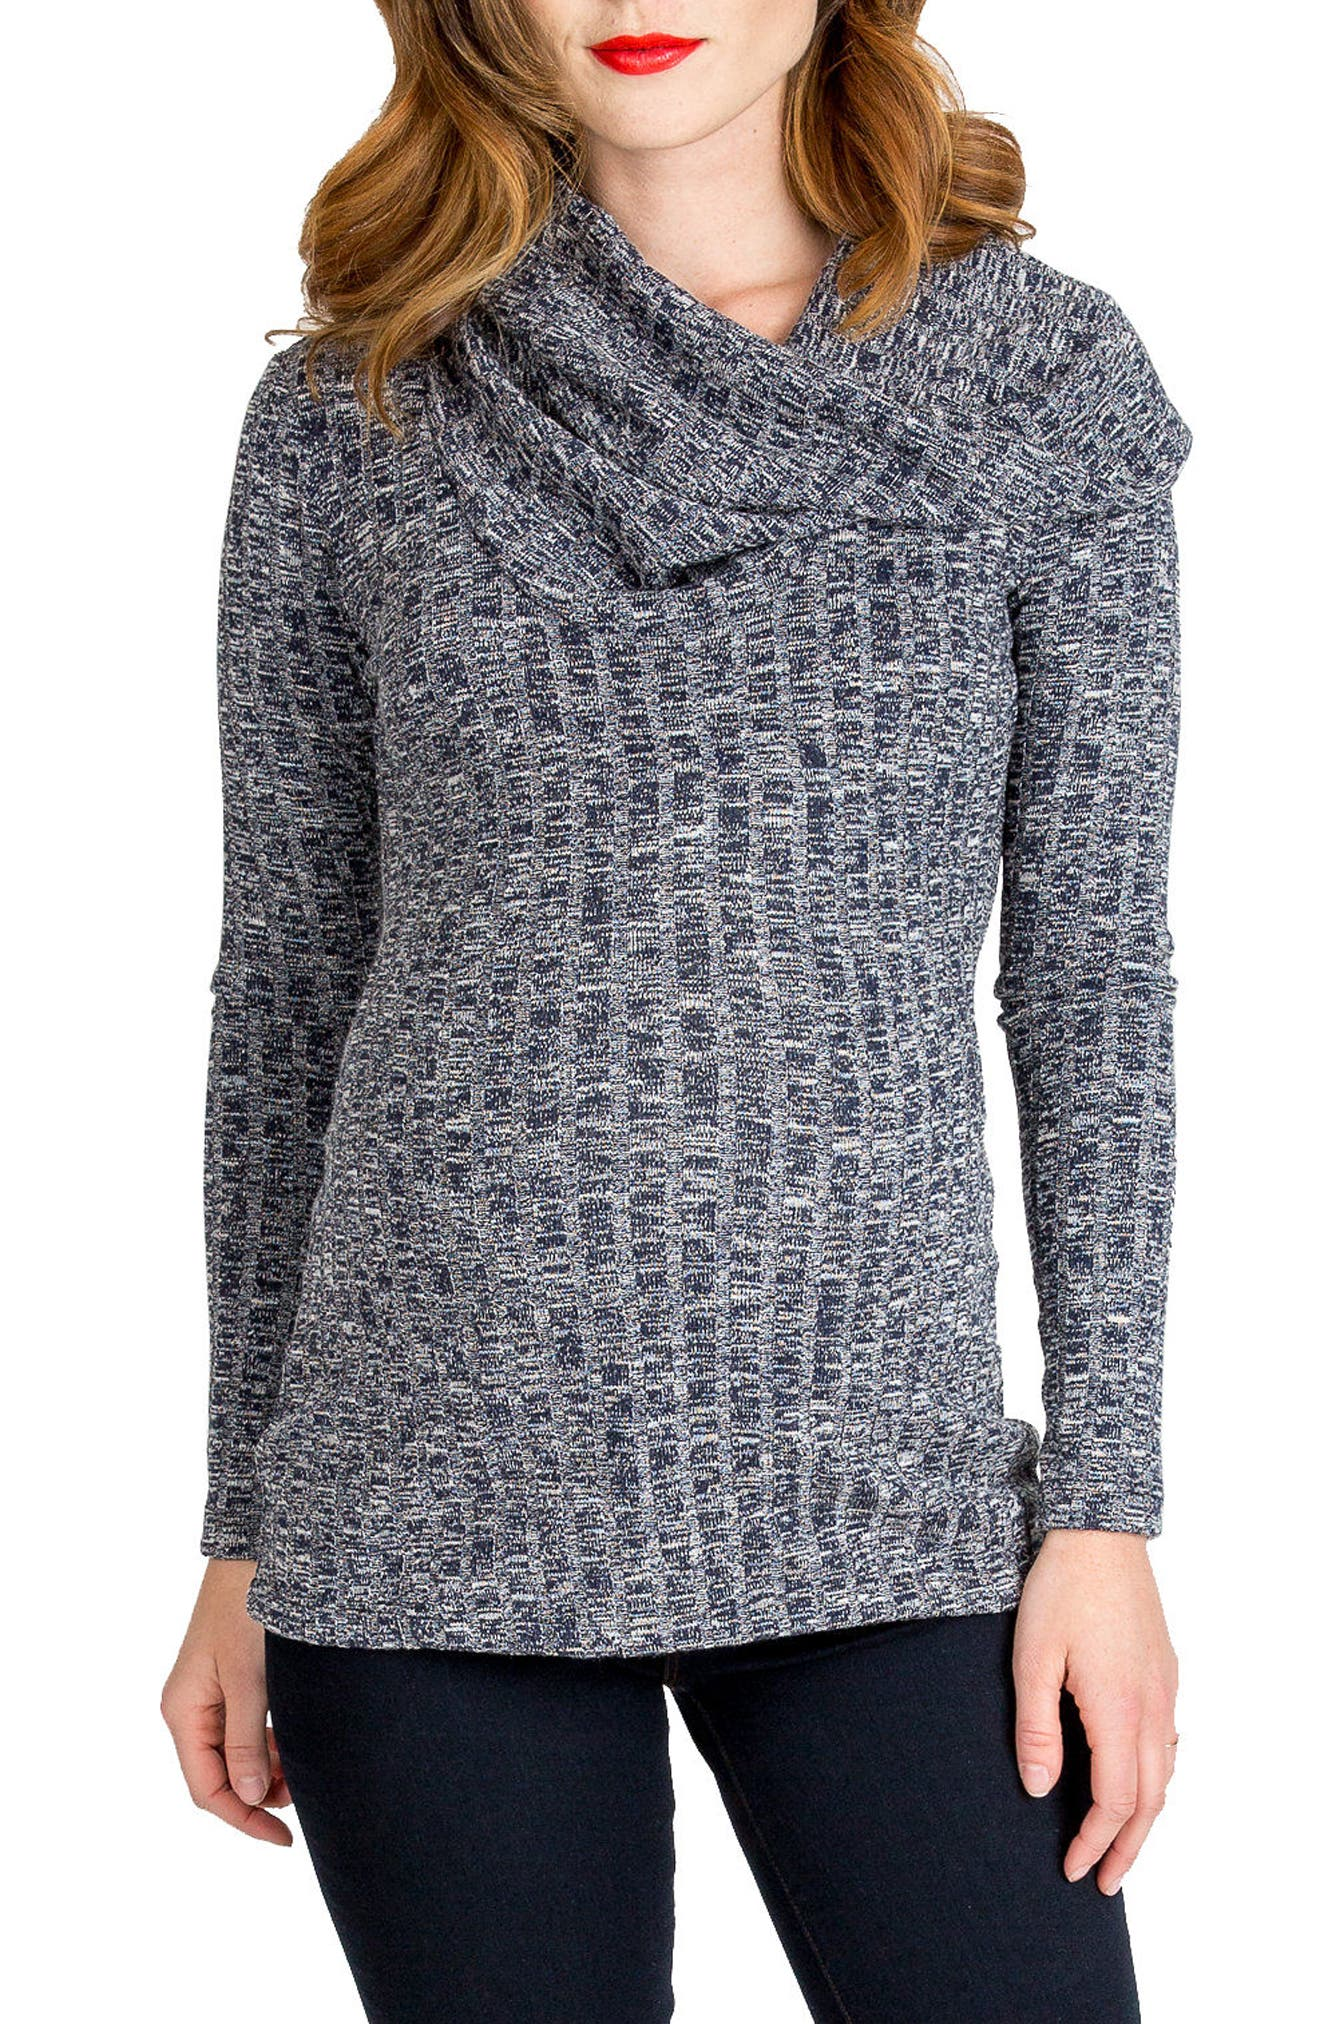 NOM MATERNITY, Ophelia Cowl Neck Maternity Sweater, Main thumbnail 1, color, NAVY HEATHER RIB